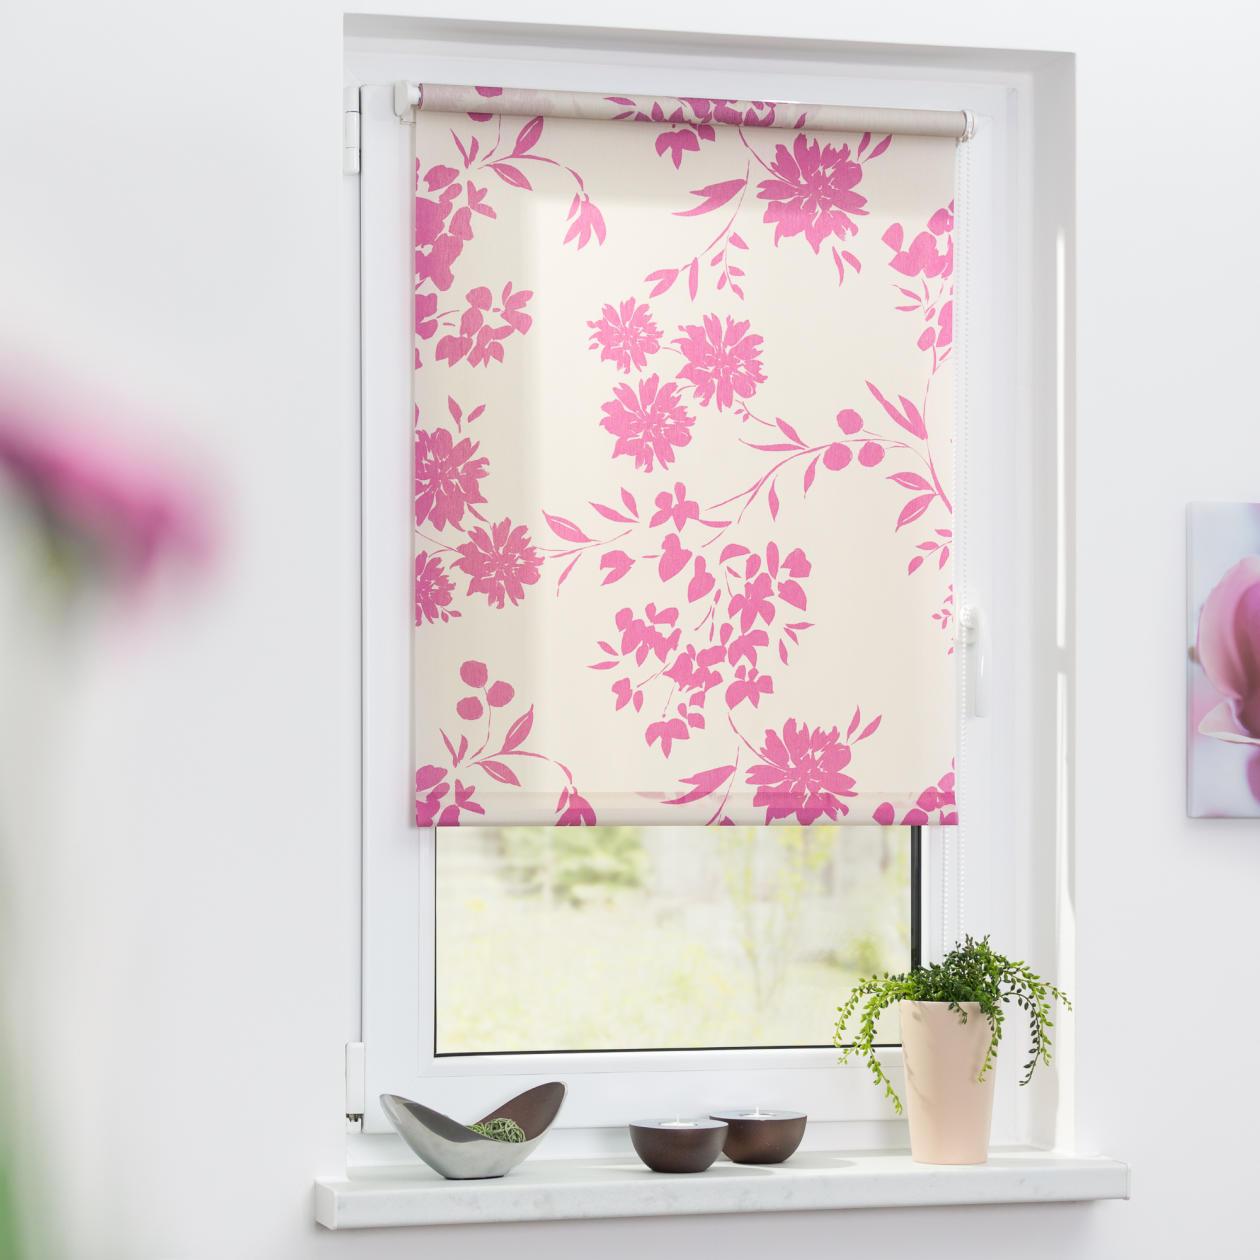 rollo klemmfix ohne bohren blickdicht vintage flowers lichblick shop. Black Bedroom Furniture Sets. Home Design Ideas